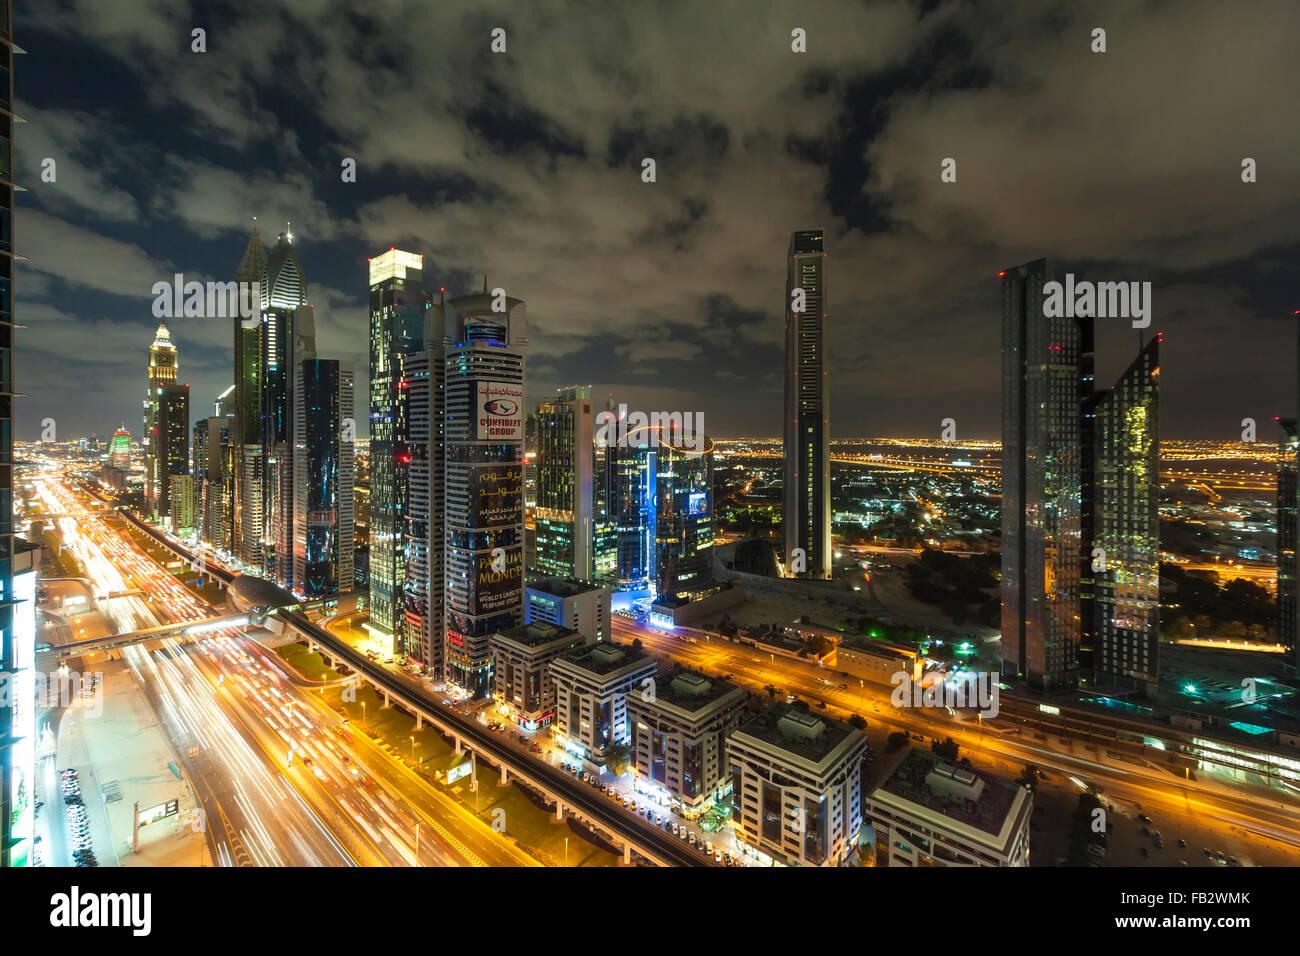 United Arab Emirates, Dubai, Sheikh Zayed Rd, traffic and new high rise buildings along Dubai's main road - Stock Image